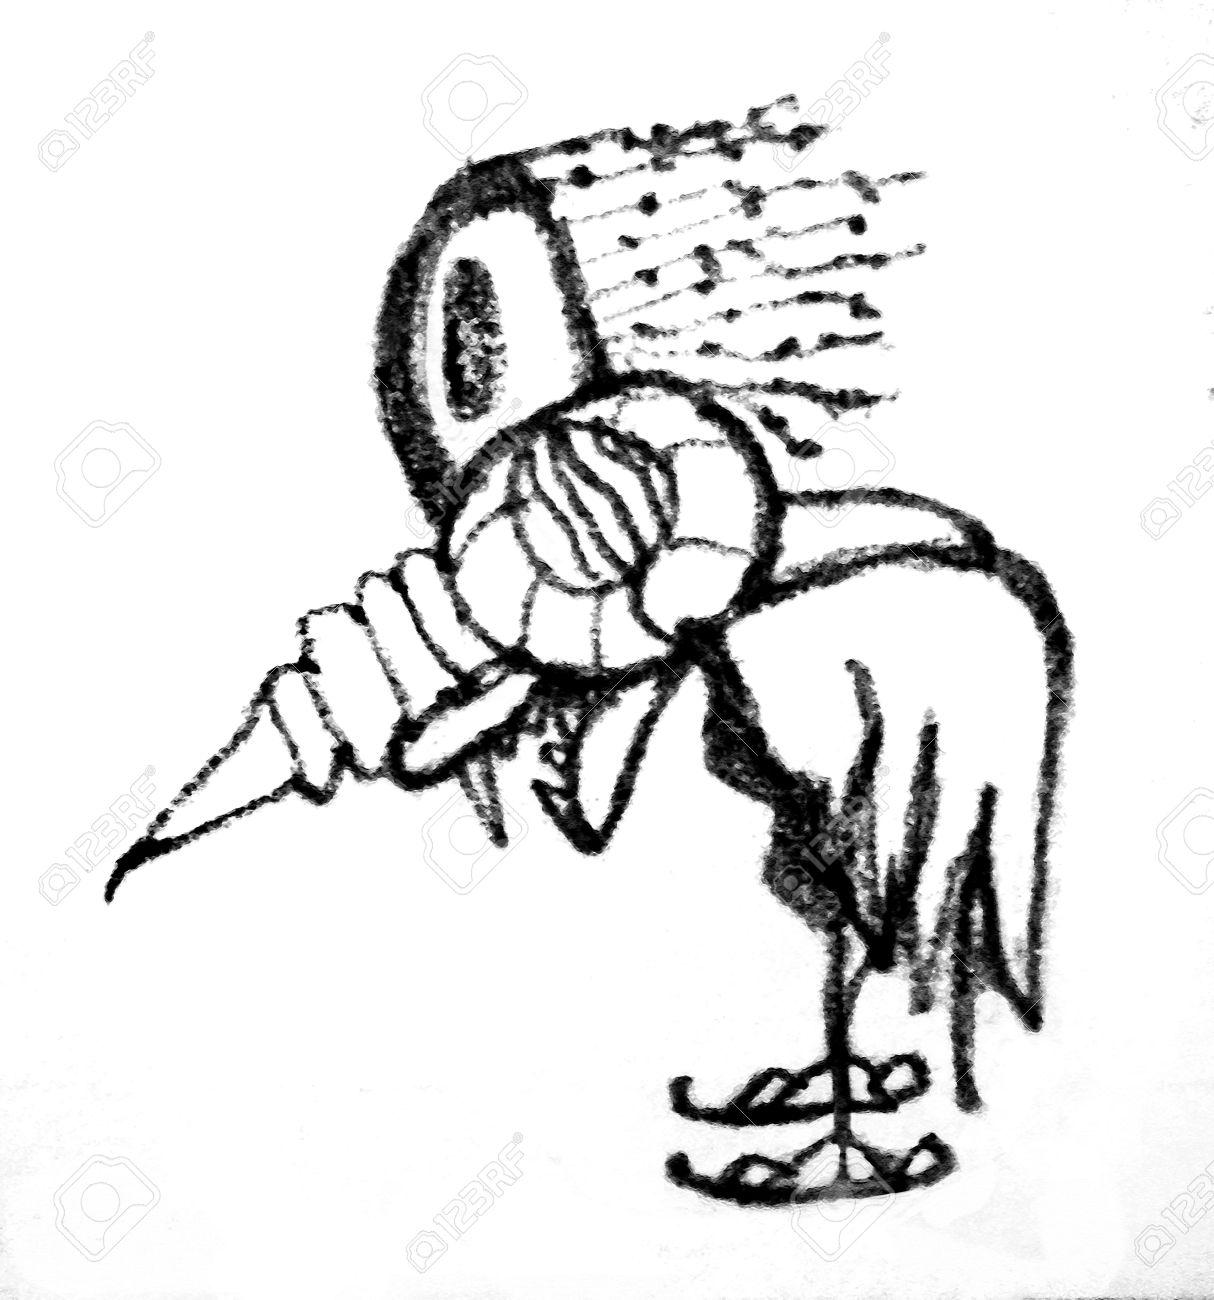 1214x1300 Pencil Drawing Artwork Depicting An Strange Alien Bird Animal